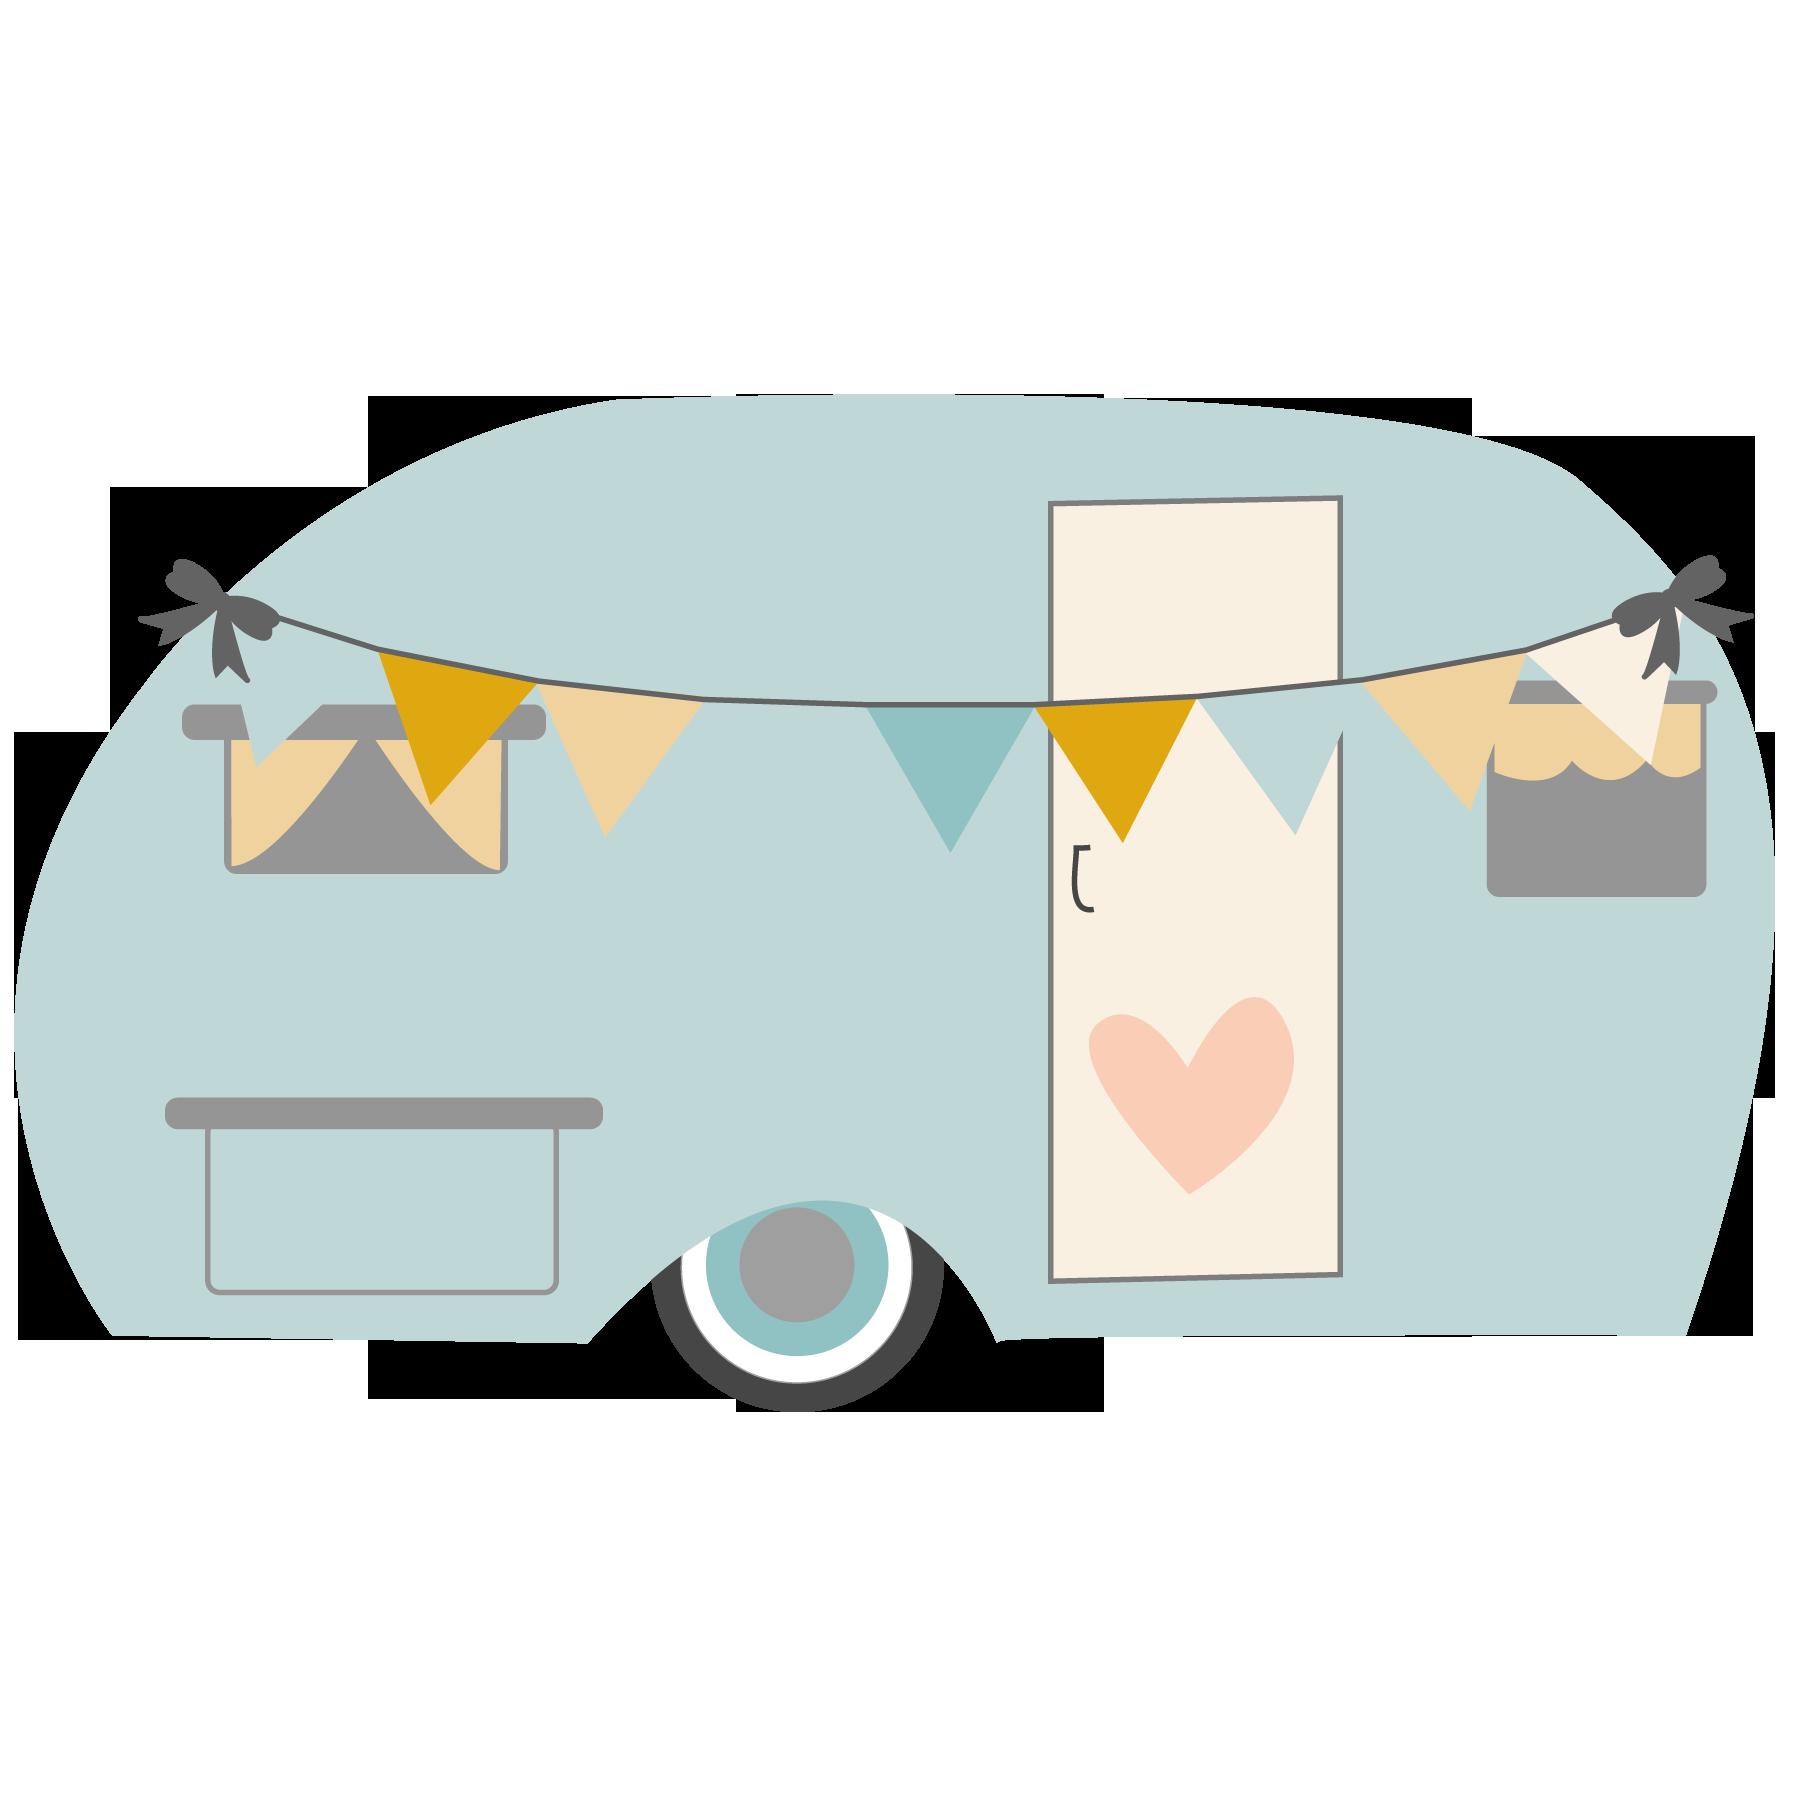 1800x1800 Camper To Glamper